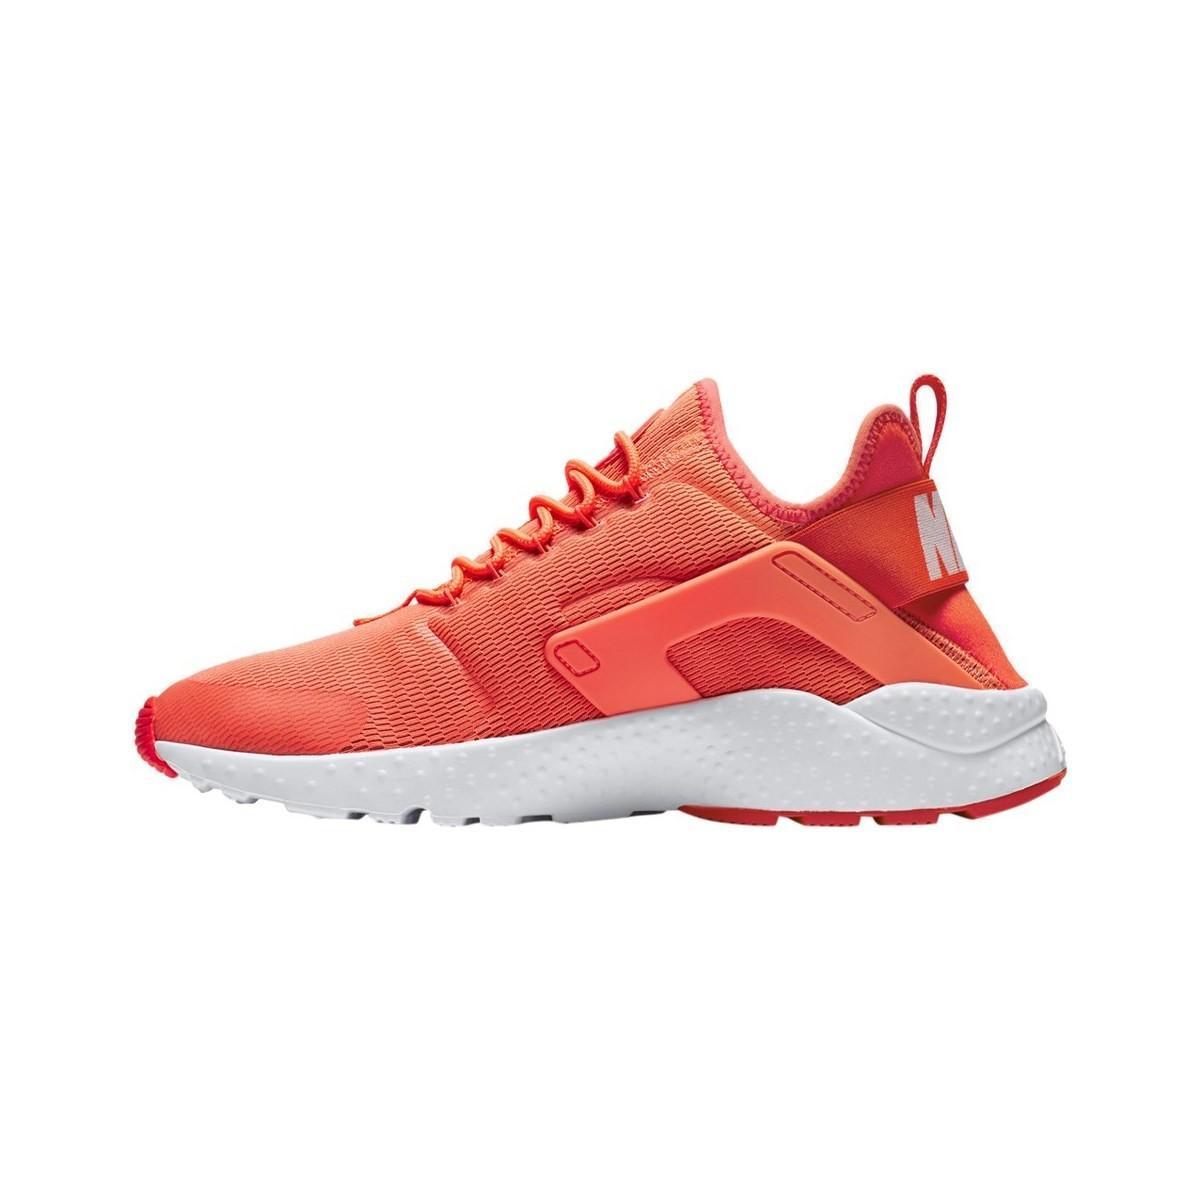 1185bb27c107d Nike - Red W Air Huarache Run Ultra Women s Shoes (trainers) In Multicolour  -. View fullscreen